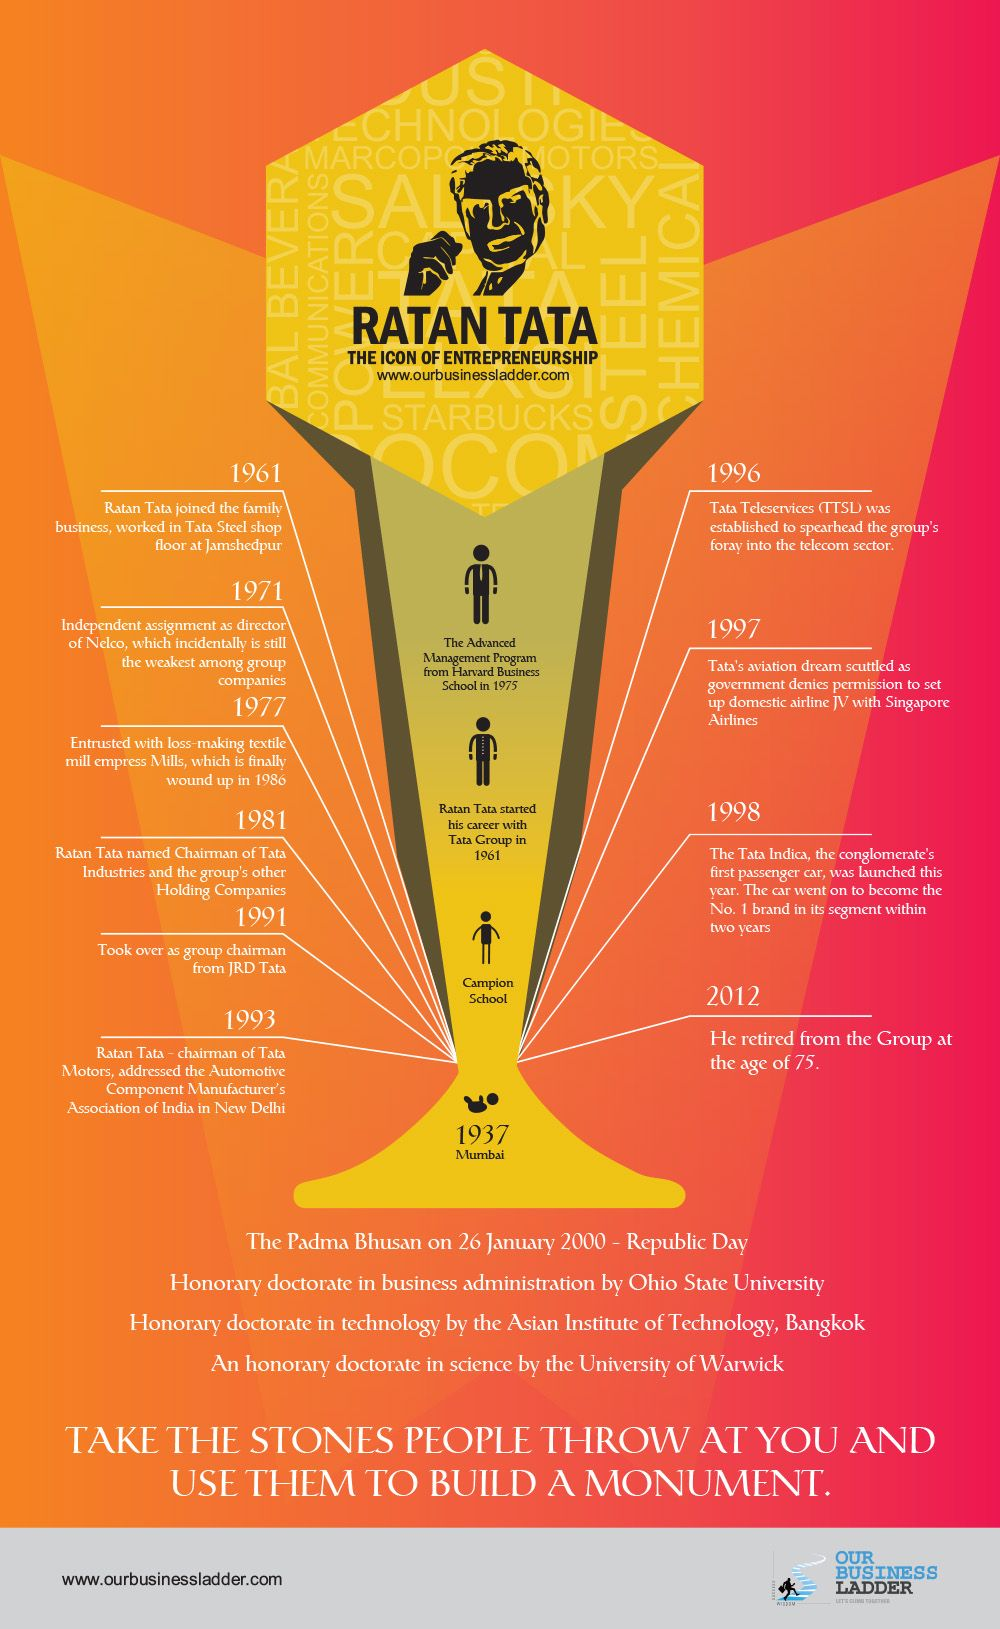 Ratan Tata Entrepreneurial Journey Ourbusinessladder